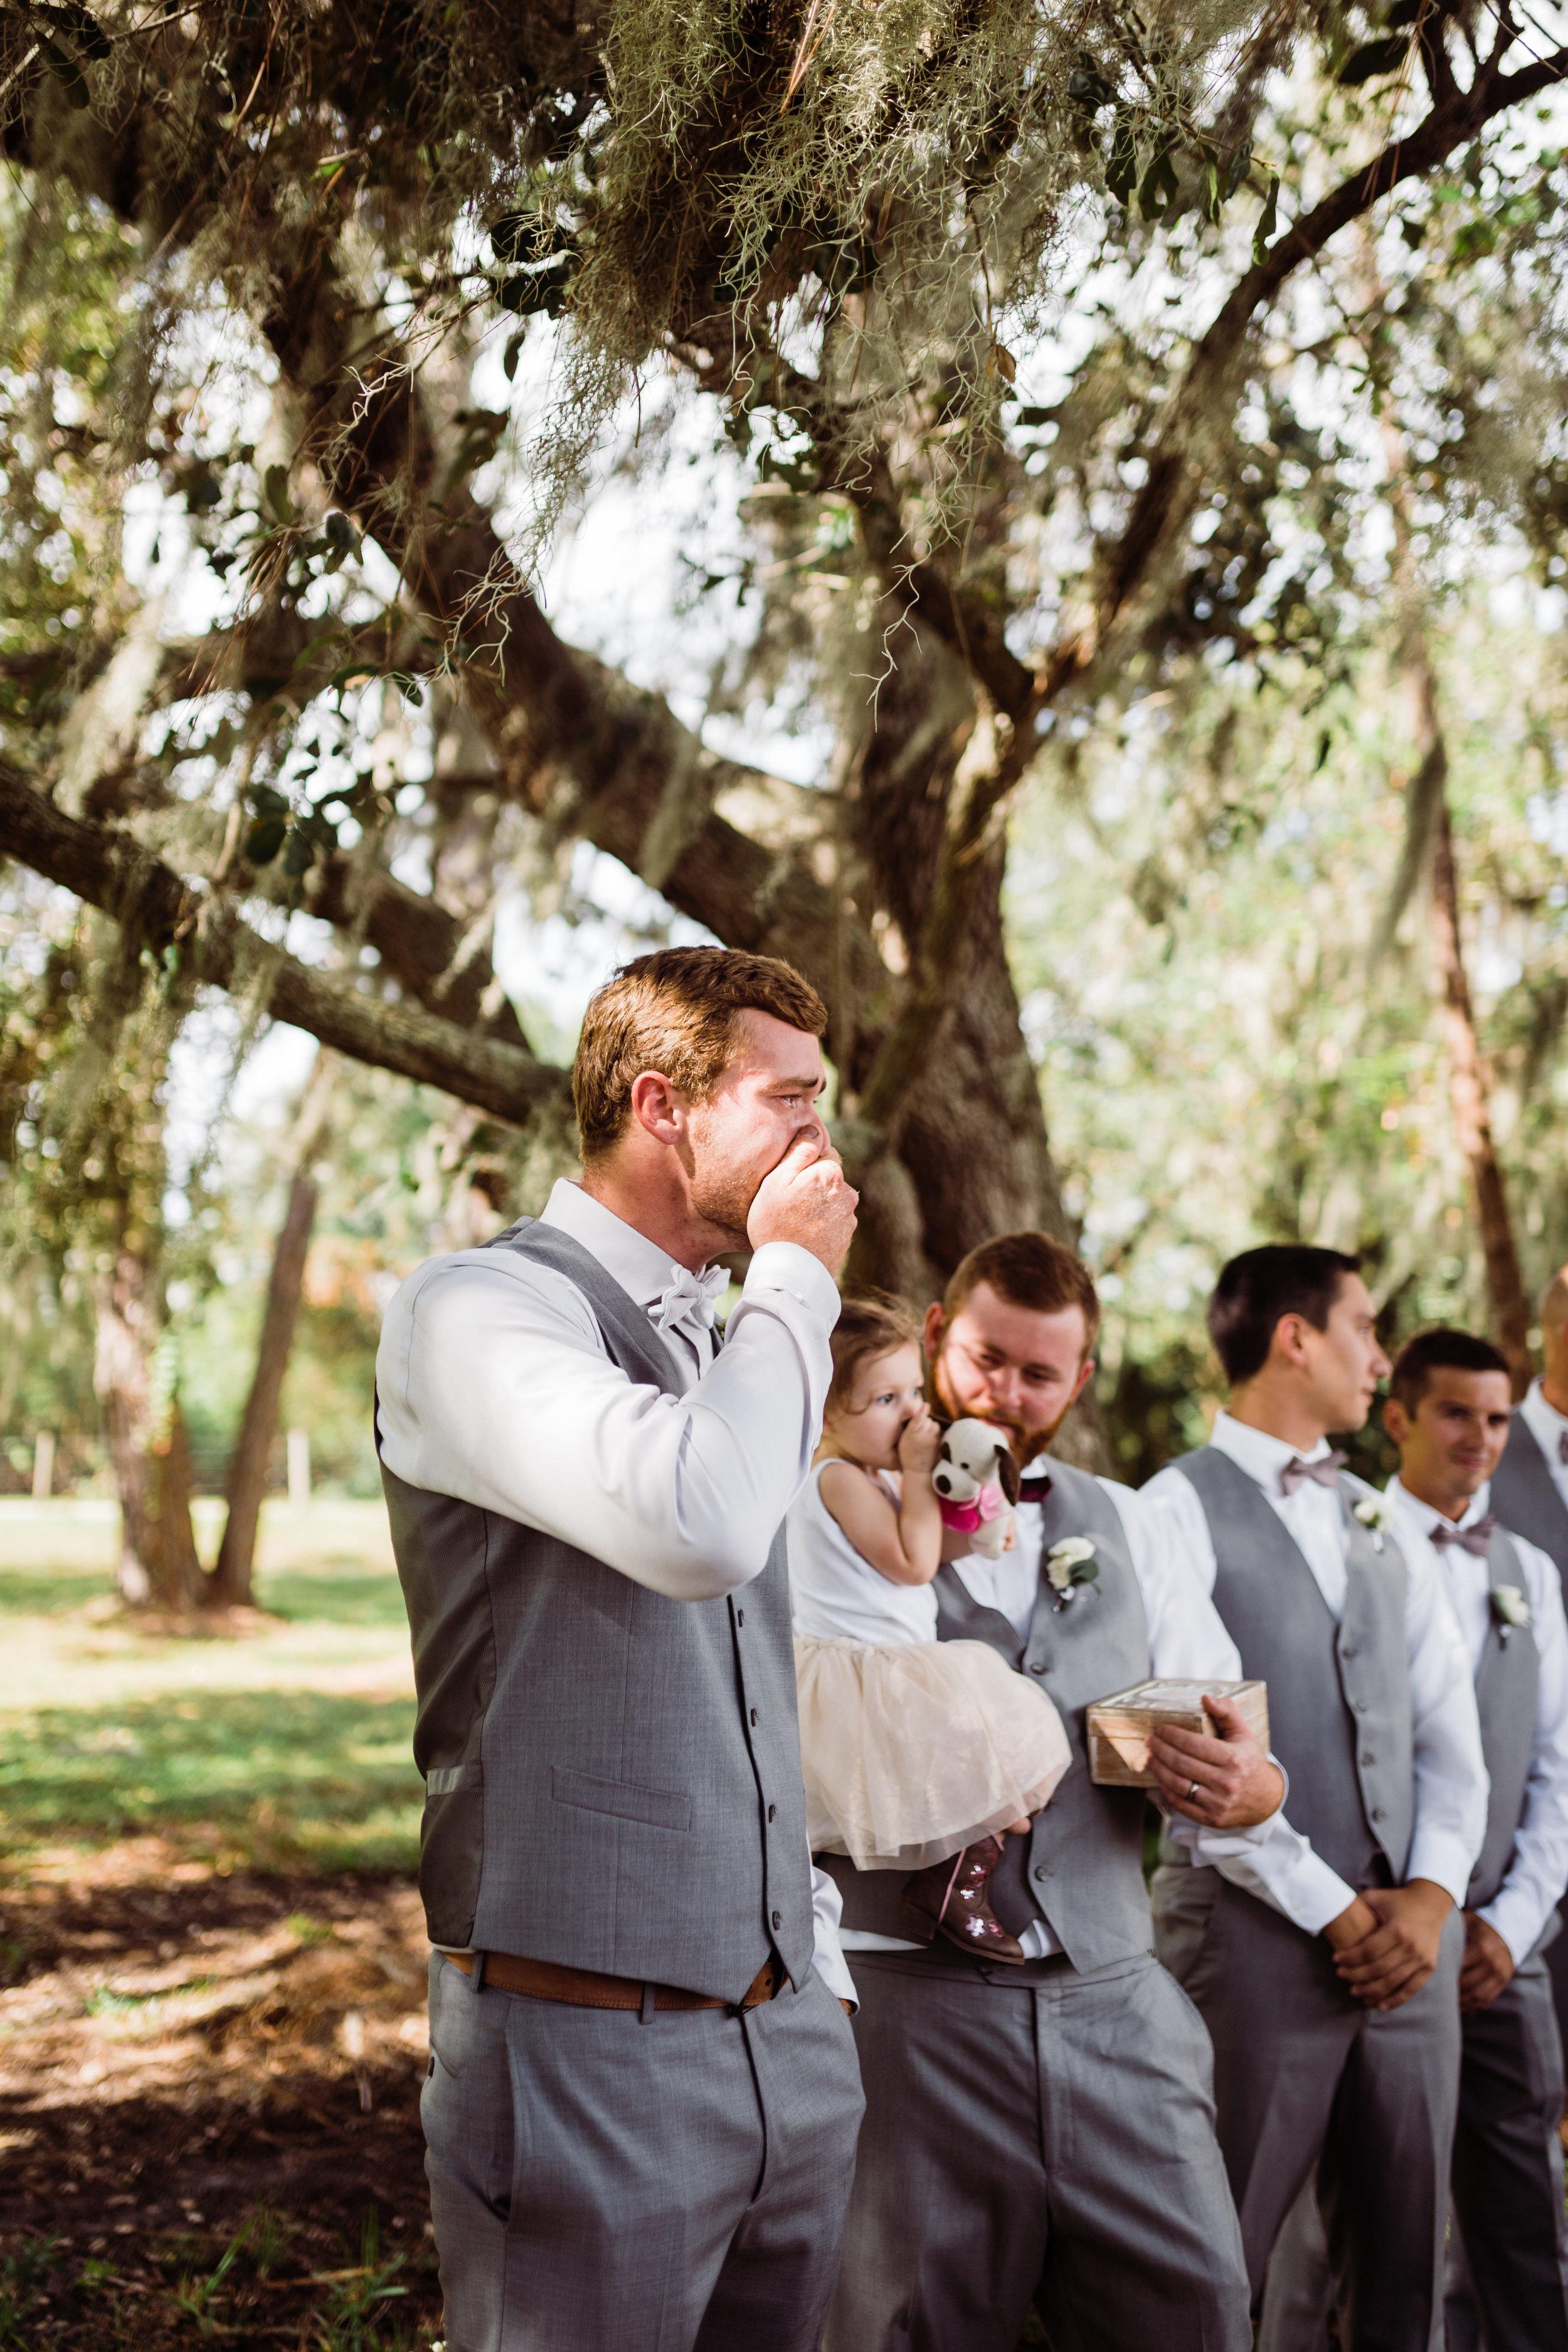 2017.10.14 Samantha and Matthew Crabtree Sarasota Wedding (127 of 708).jpg